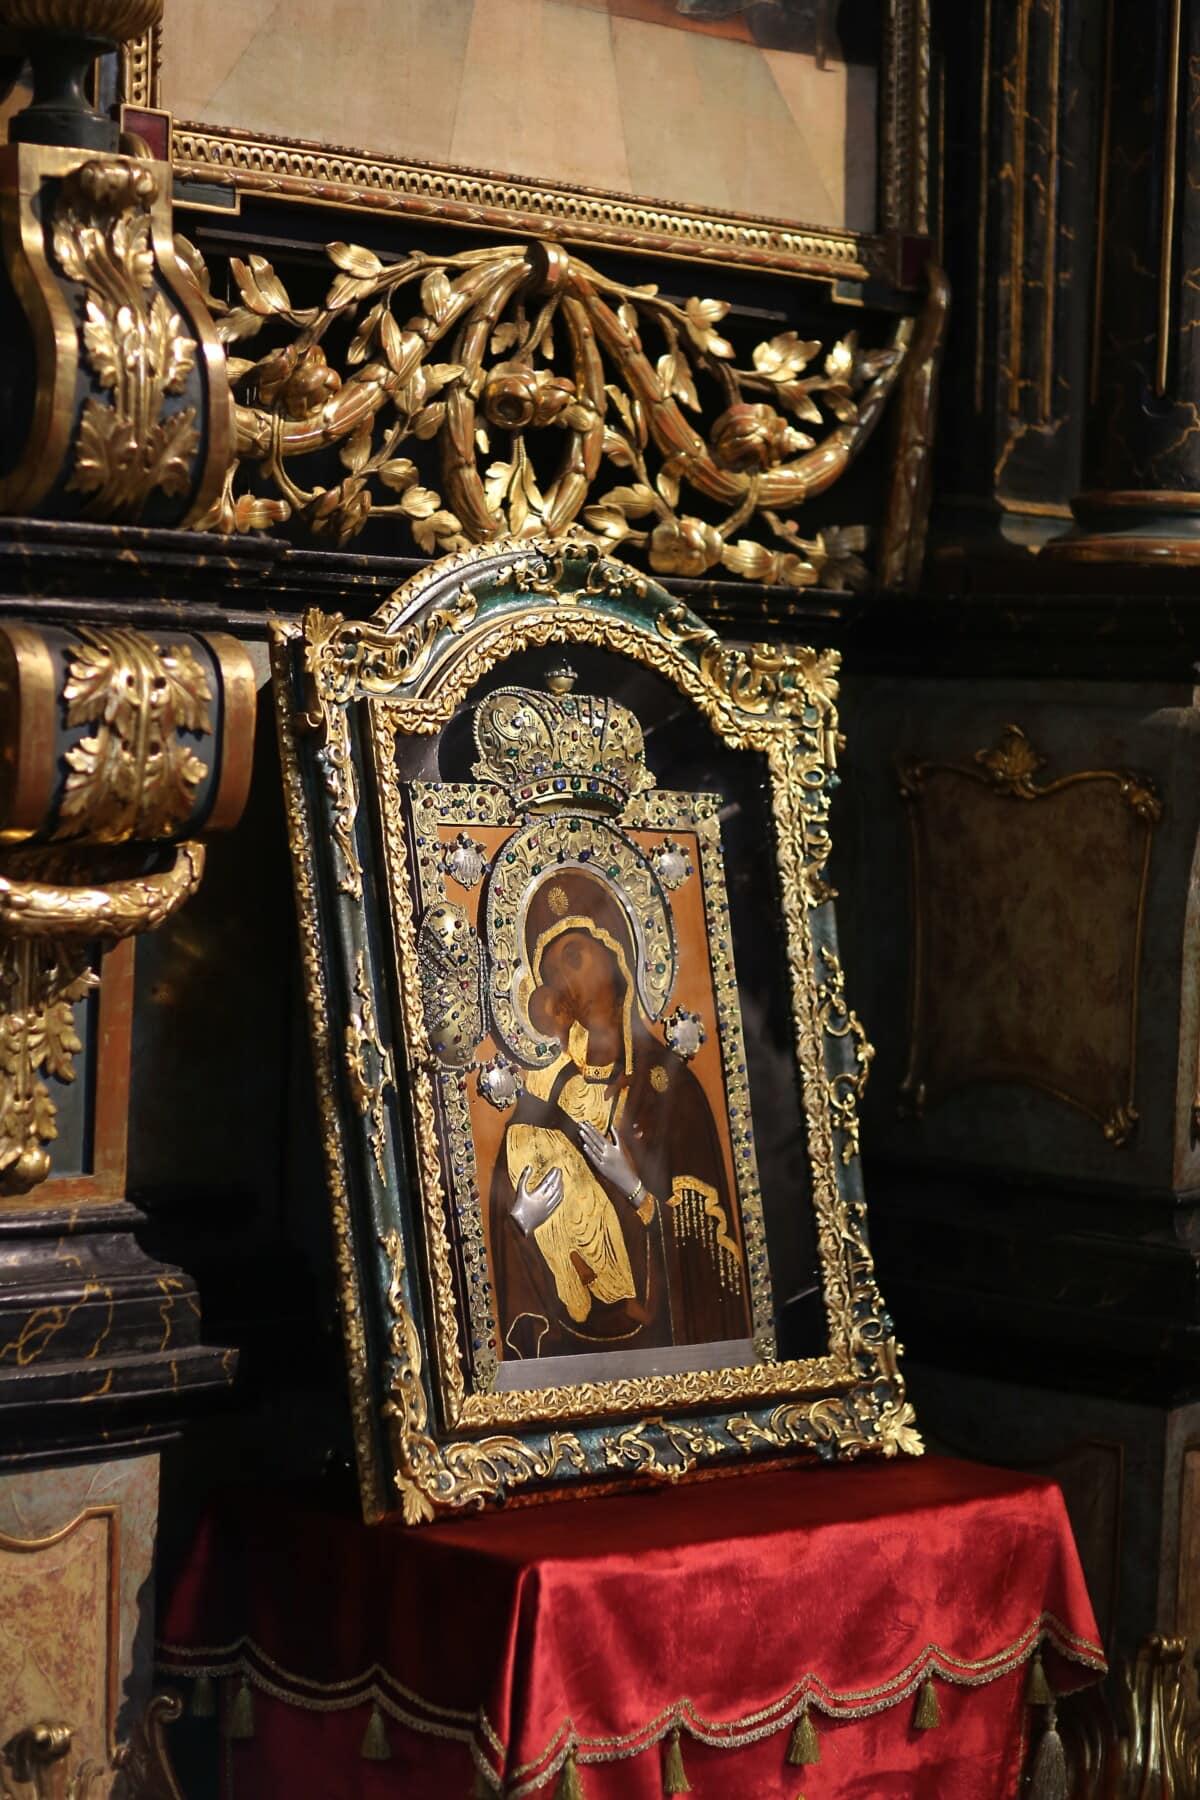 orthodoxe, icône, Christianisme, Christ, ornement, beaux arts, antiquité, art, architecture, religion